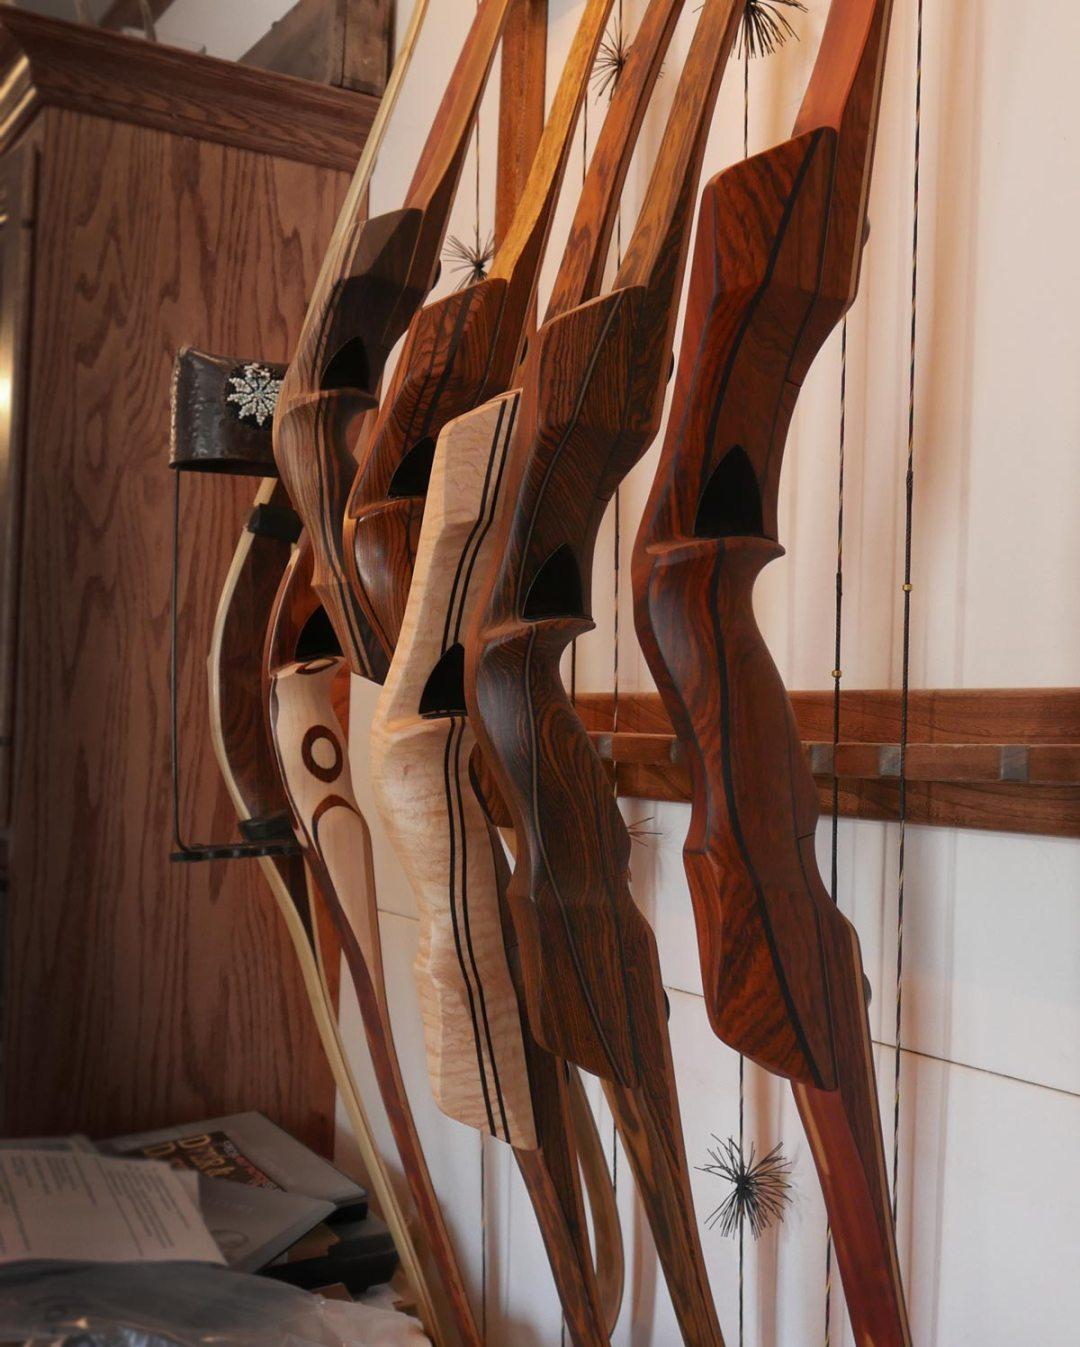 Handmade longbows